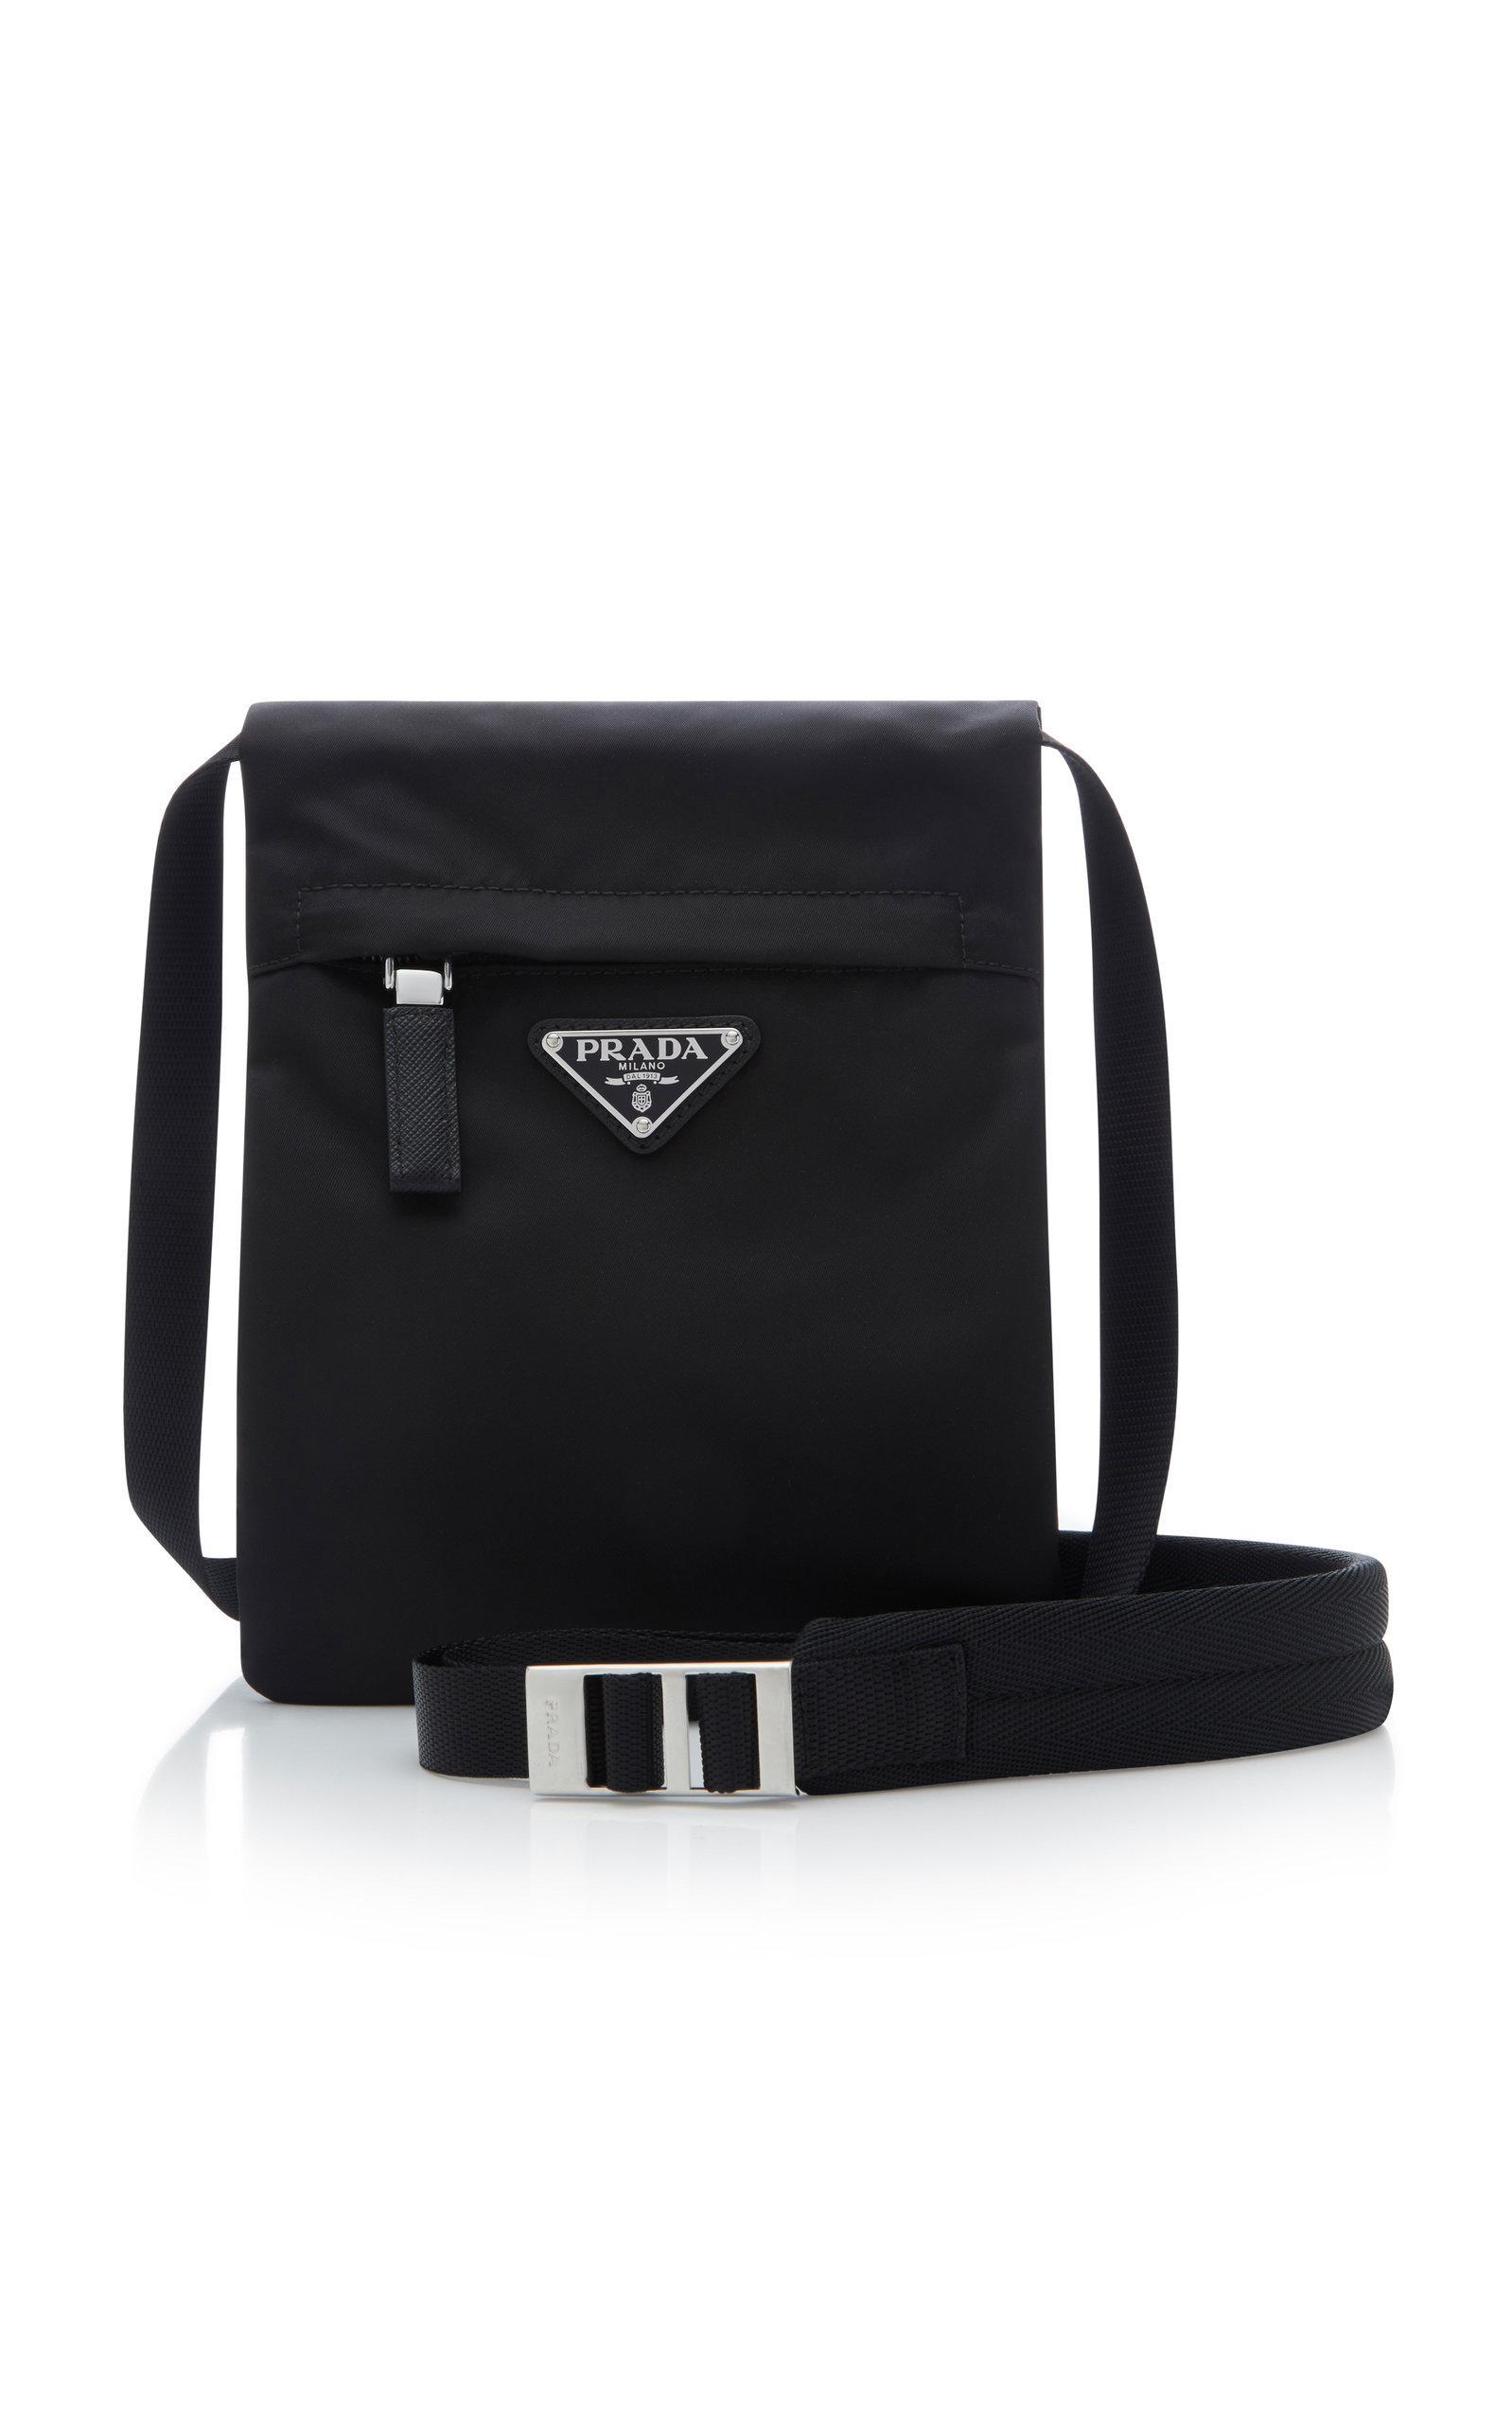 006b0706e5 Lyst - Prada Small Technical Crossbody Bag in Black for Men